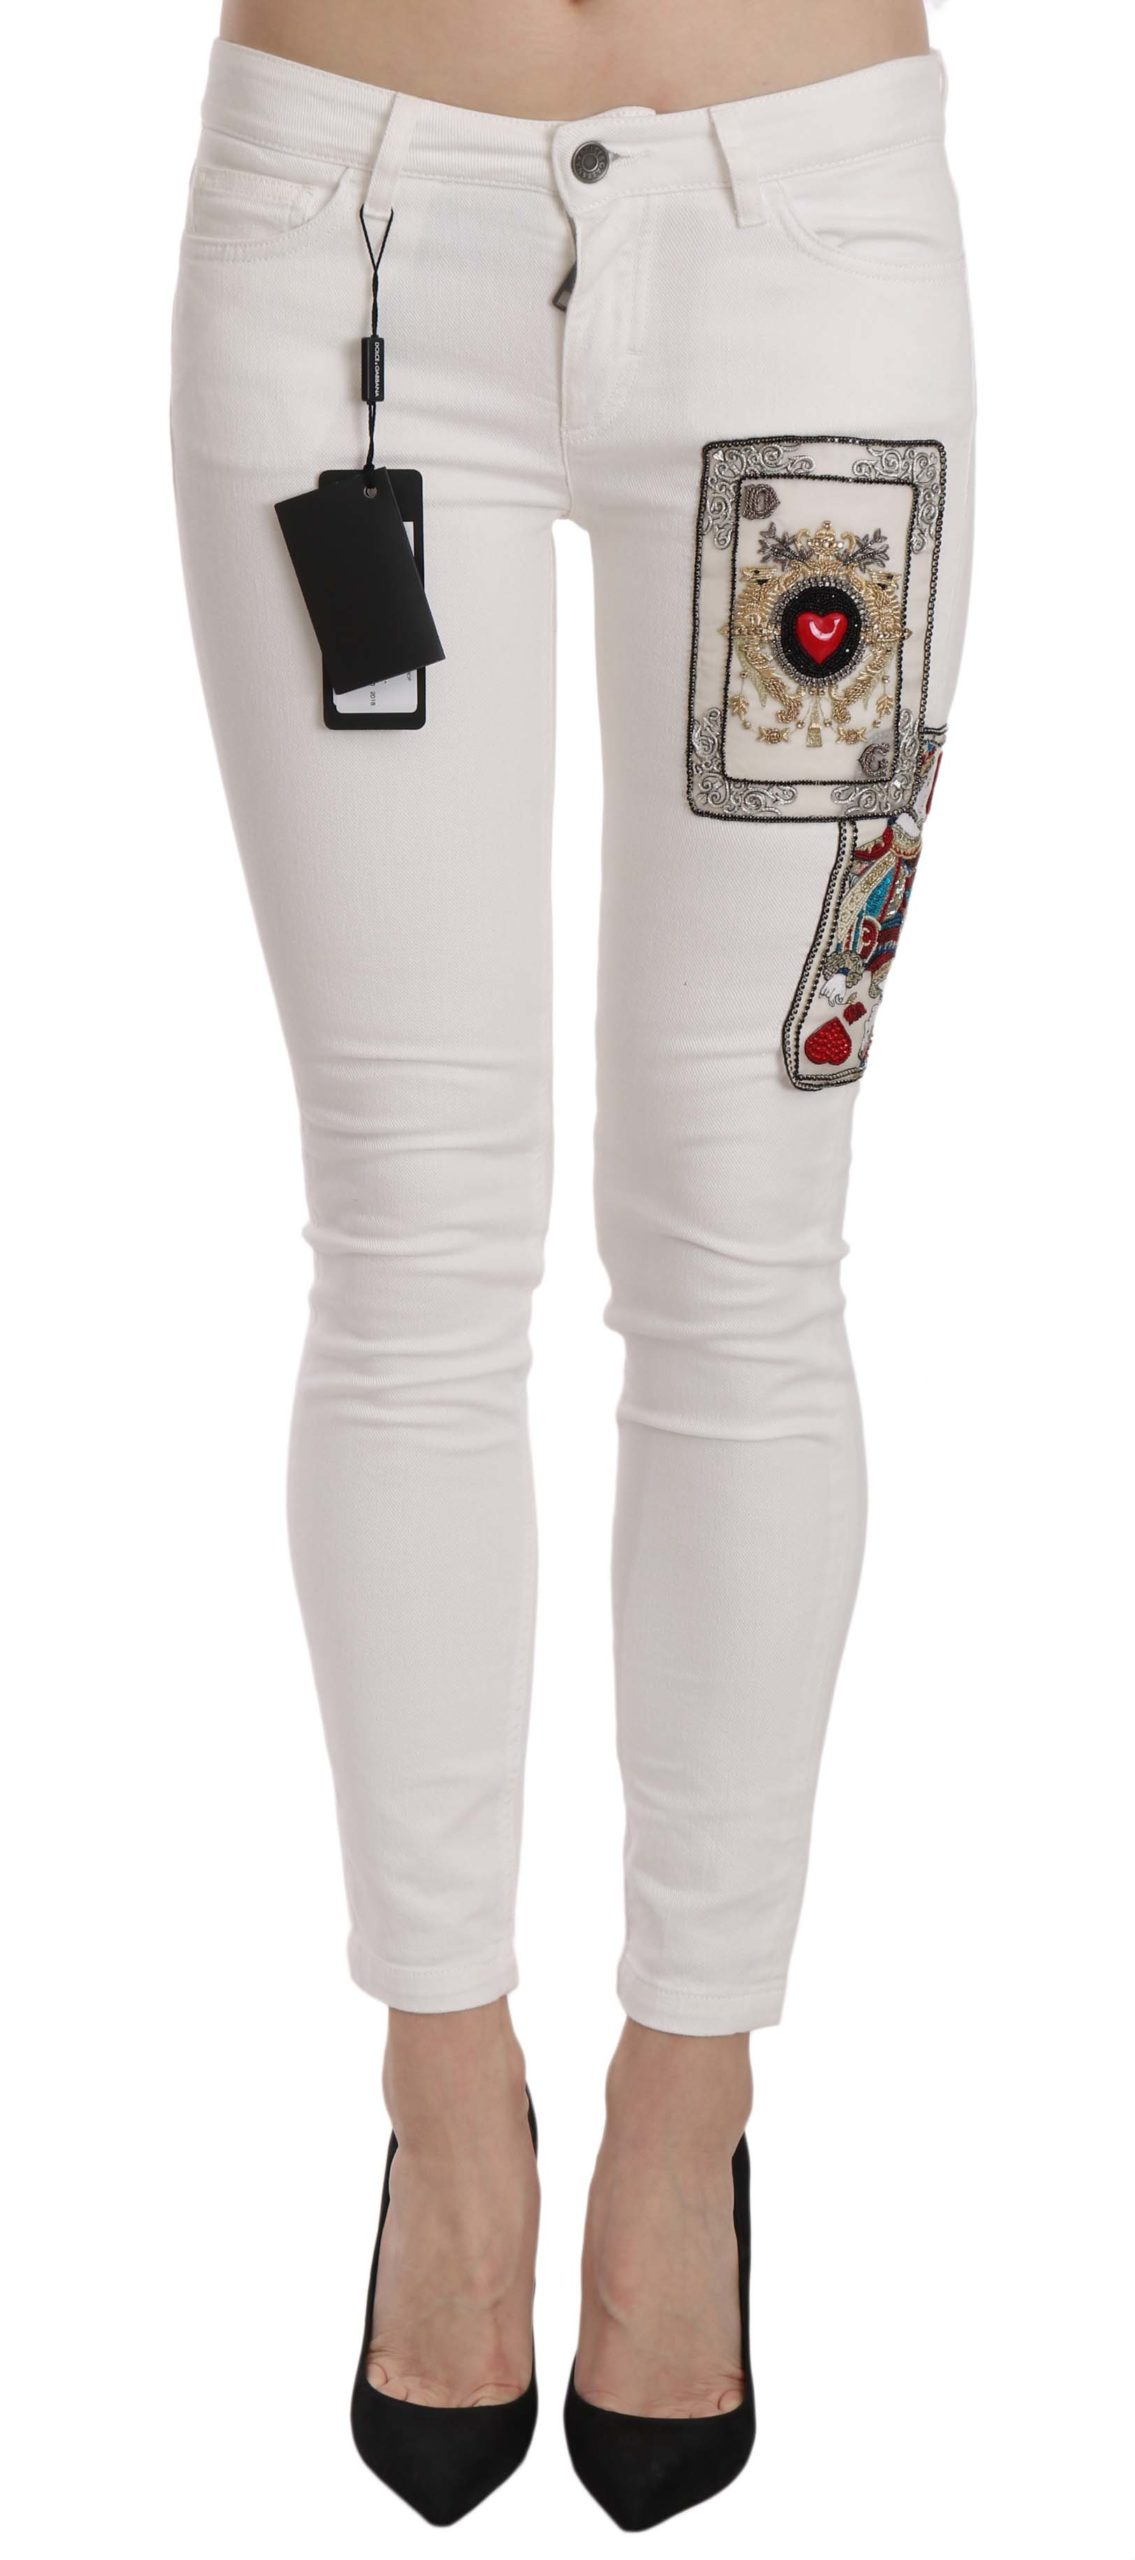 Dolce & Gabbana Women's Of Hearts Crystal Skinny Jeans White PAN61198 - IT38|XS